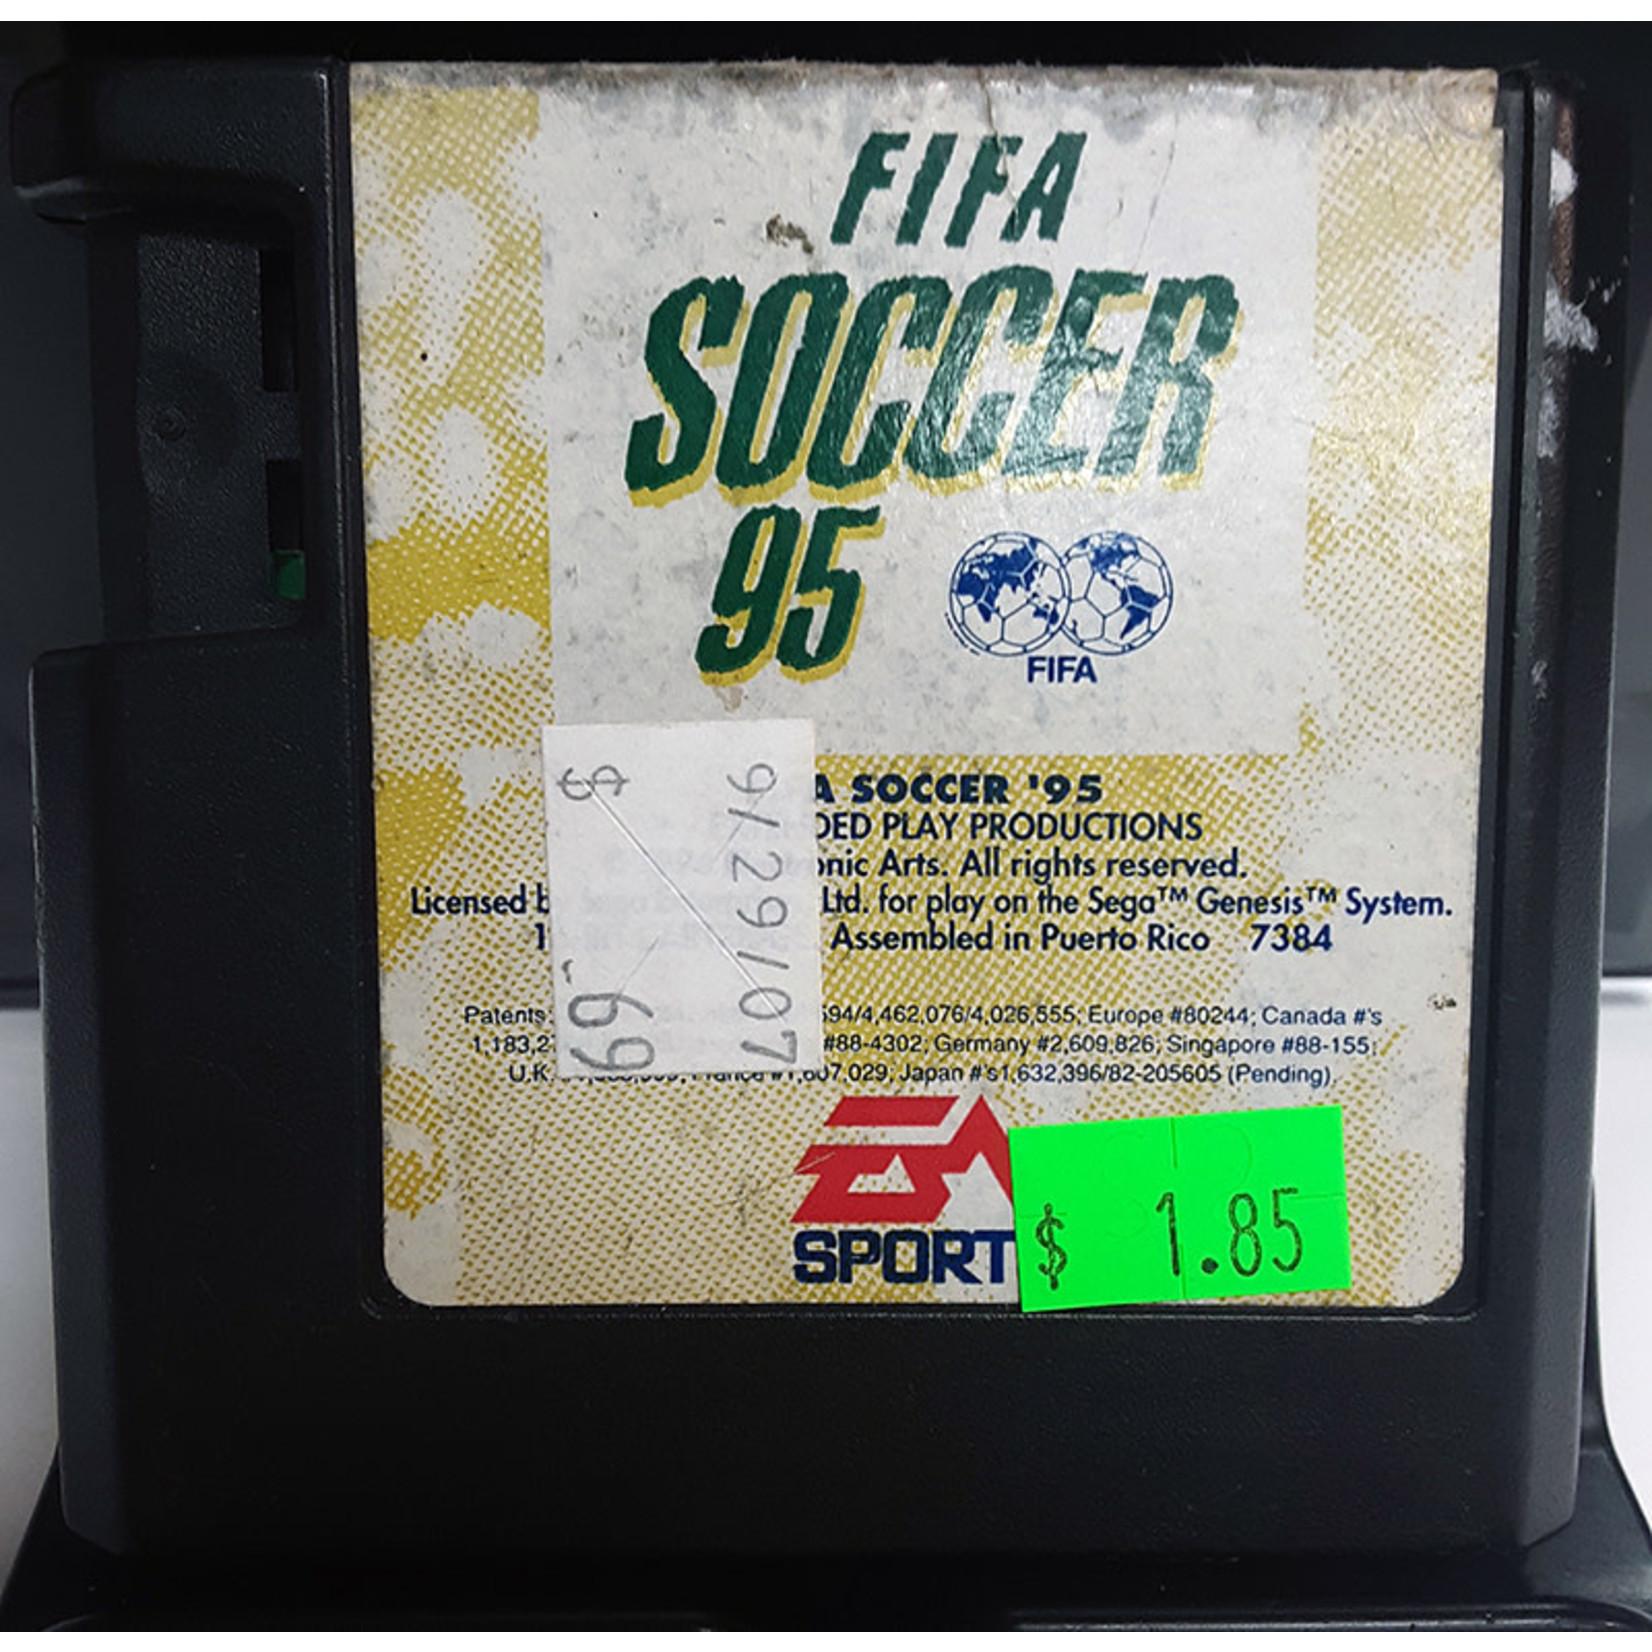 sgu-Fifa Soccer 95 (cartridge)